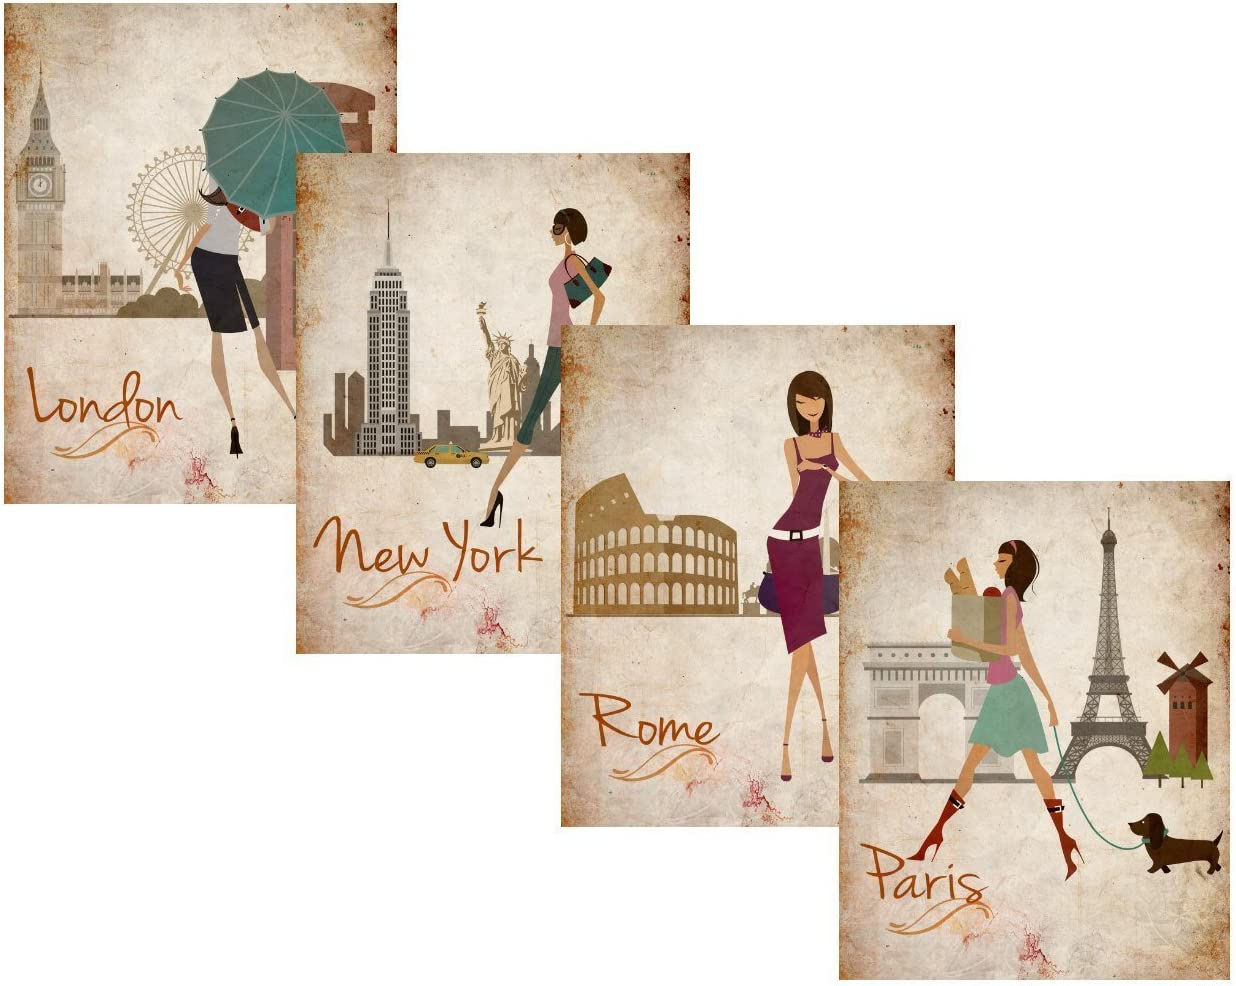 New York Paris beauty room bedroom OFFICE Art Fashion Cities Print London